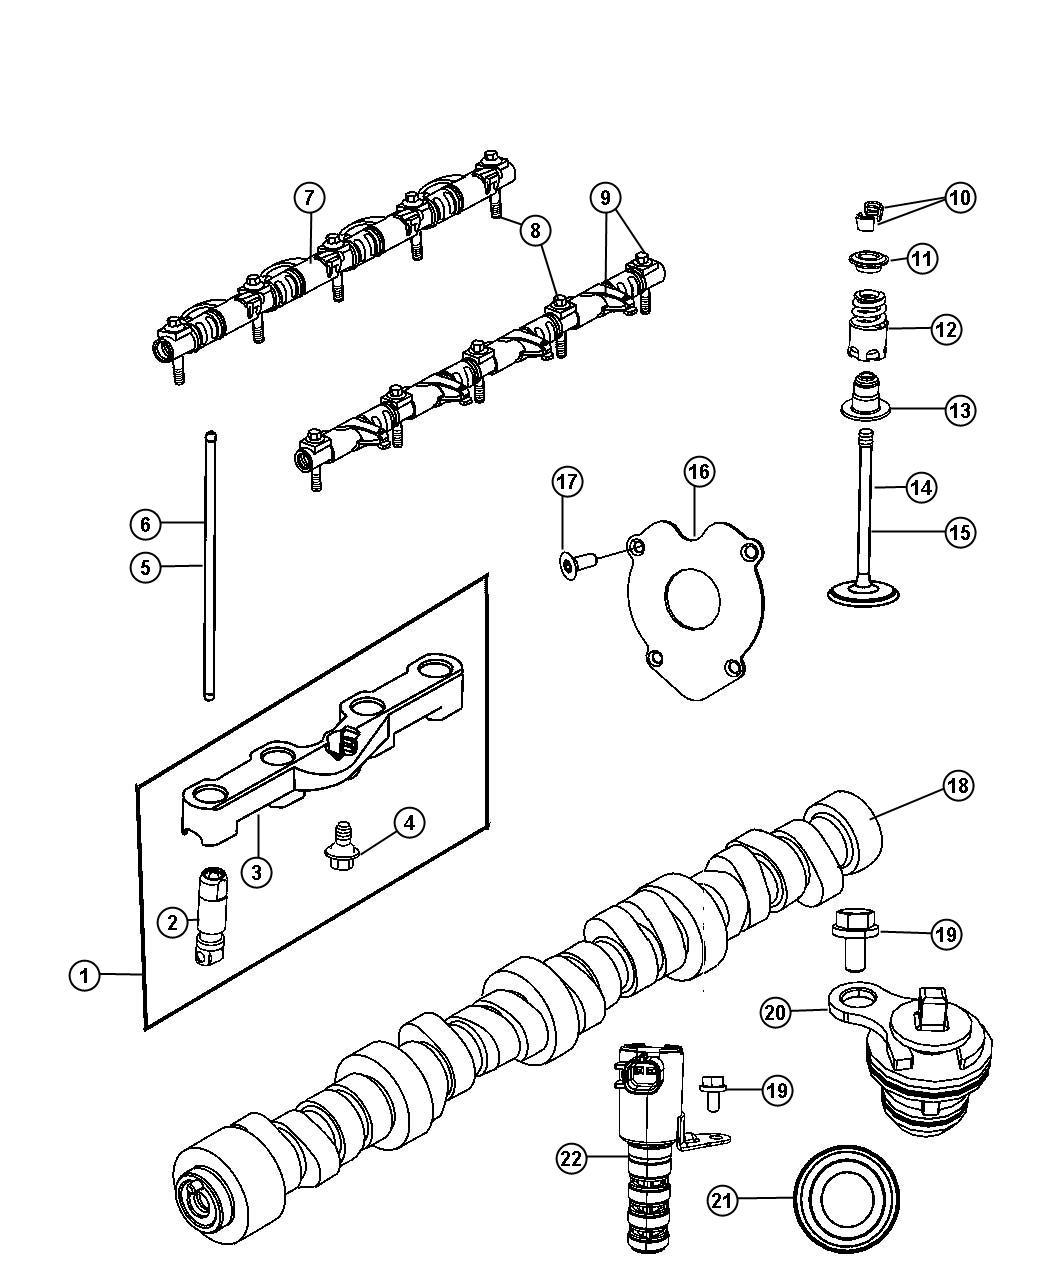 Camshaft And Valvetrain 6 4l 6 4l V8 Srt Hemi Engine